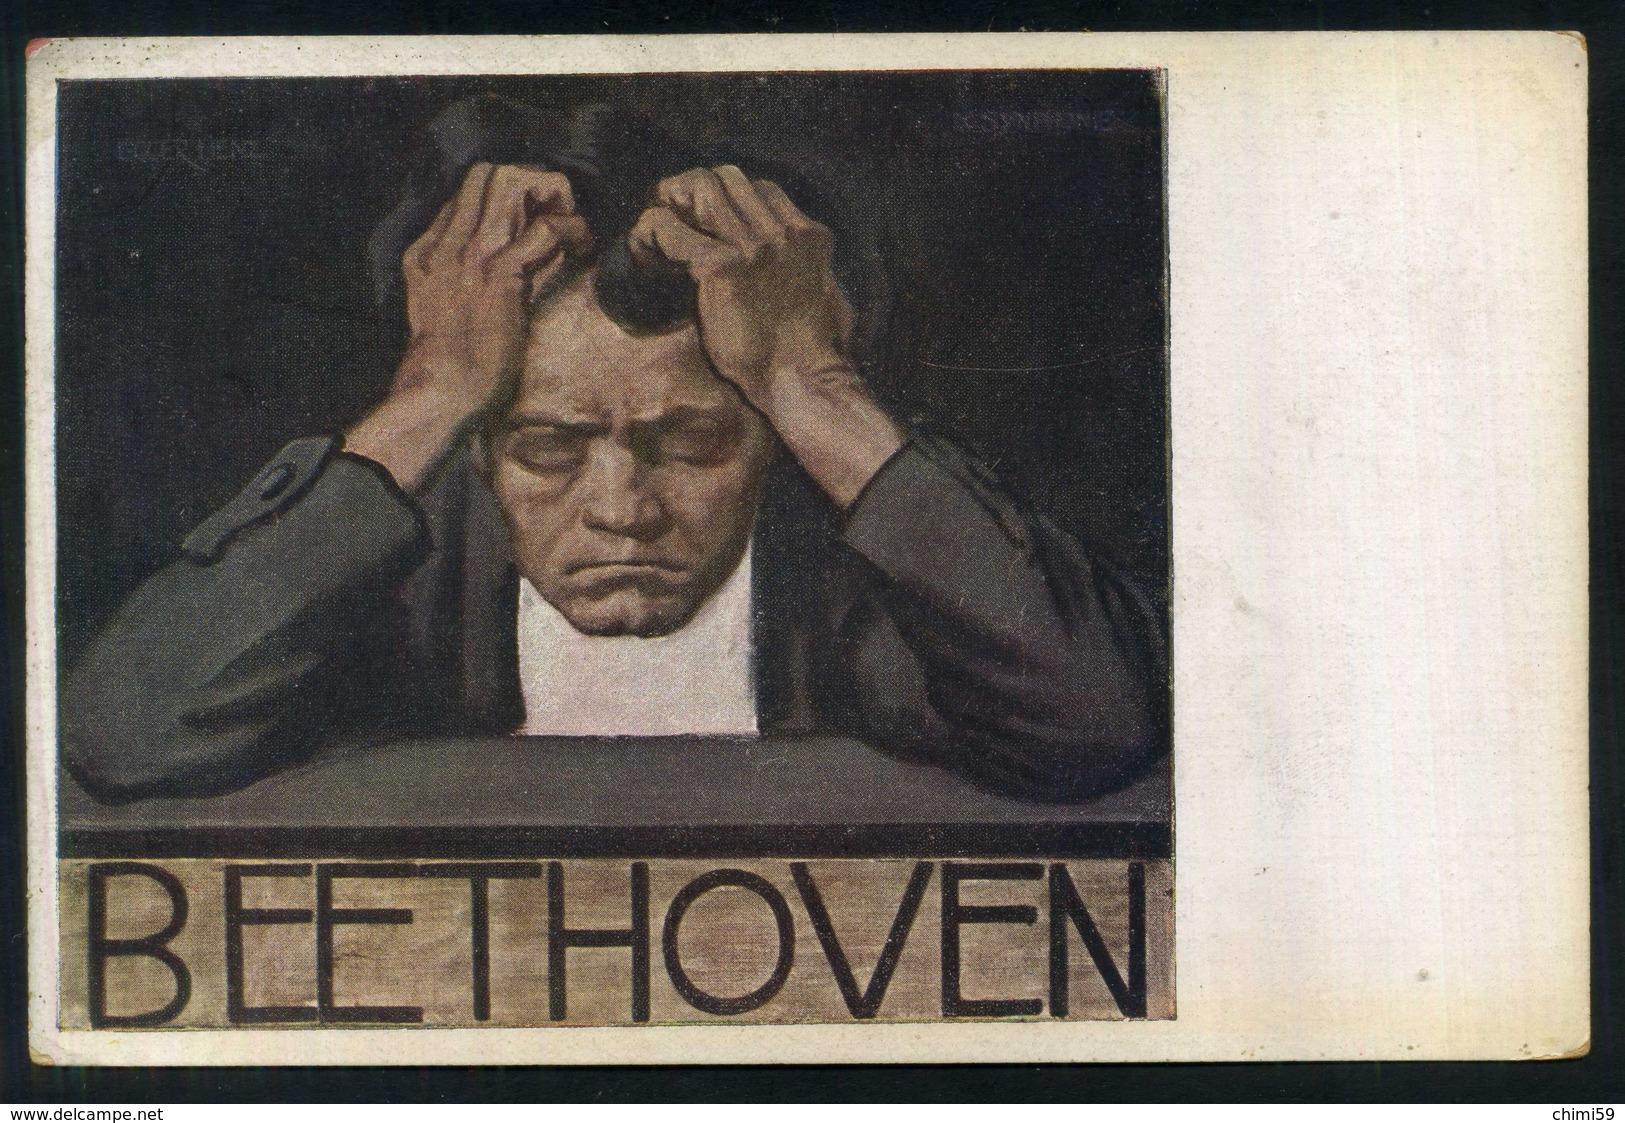 BEETHOVEN - Ediz. B. K. W. I. Nr. 909-1 - Cantanti E Musicisti